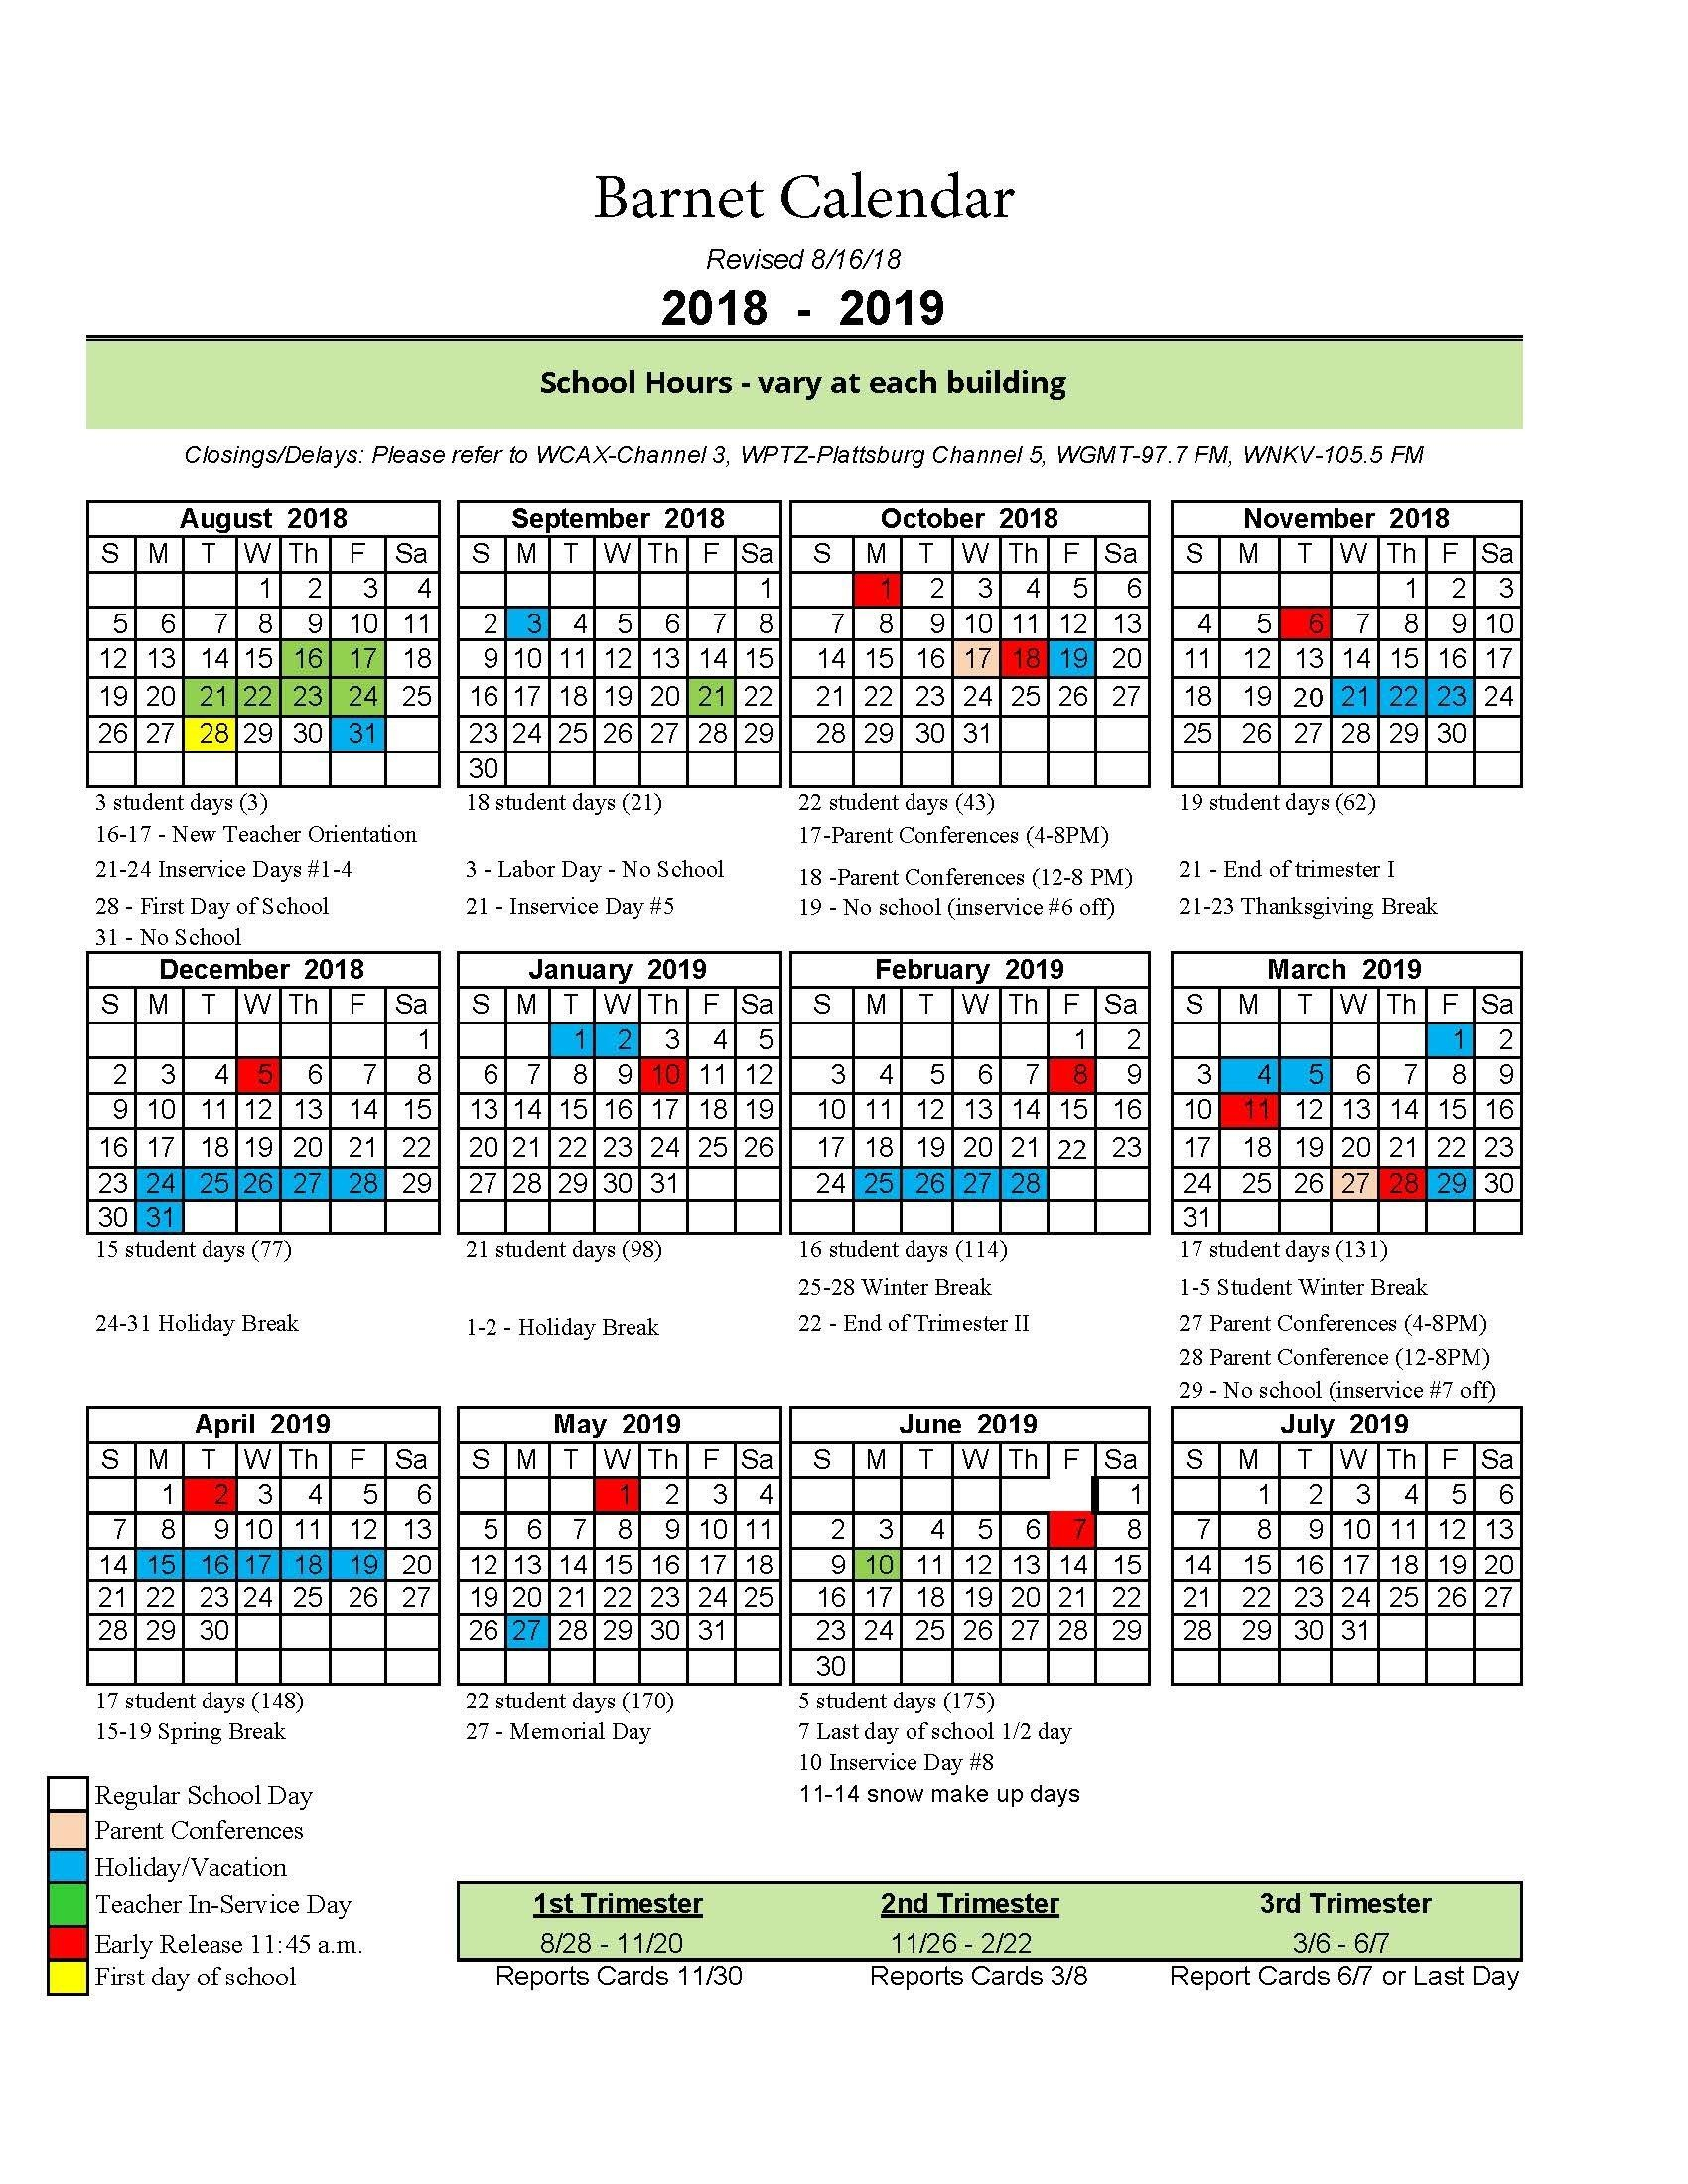 Vt Calendar 2018 2019 Print For Free Of Cost – Calendaro.download Calendar 2019 Vt